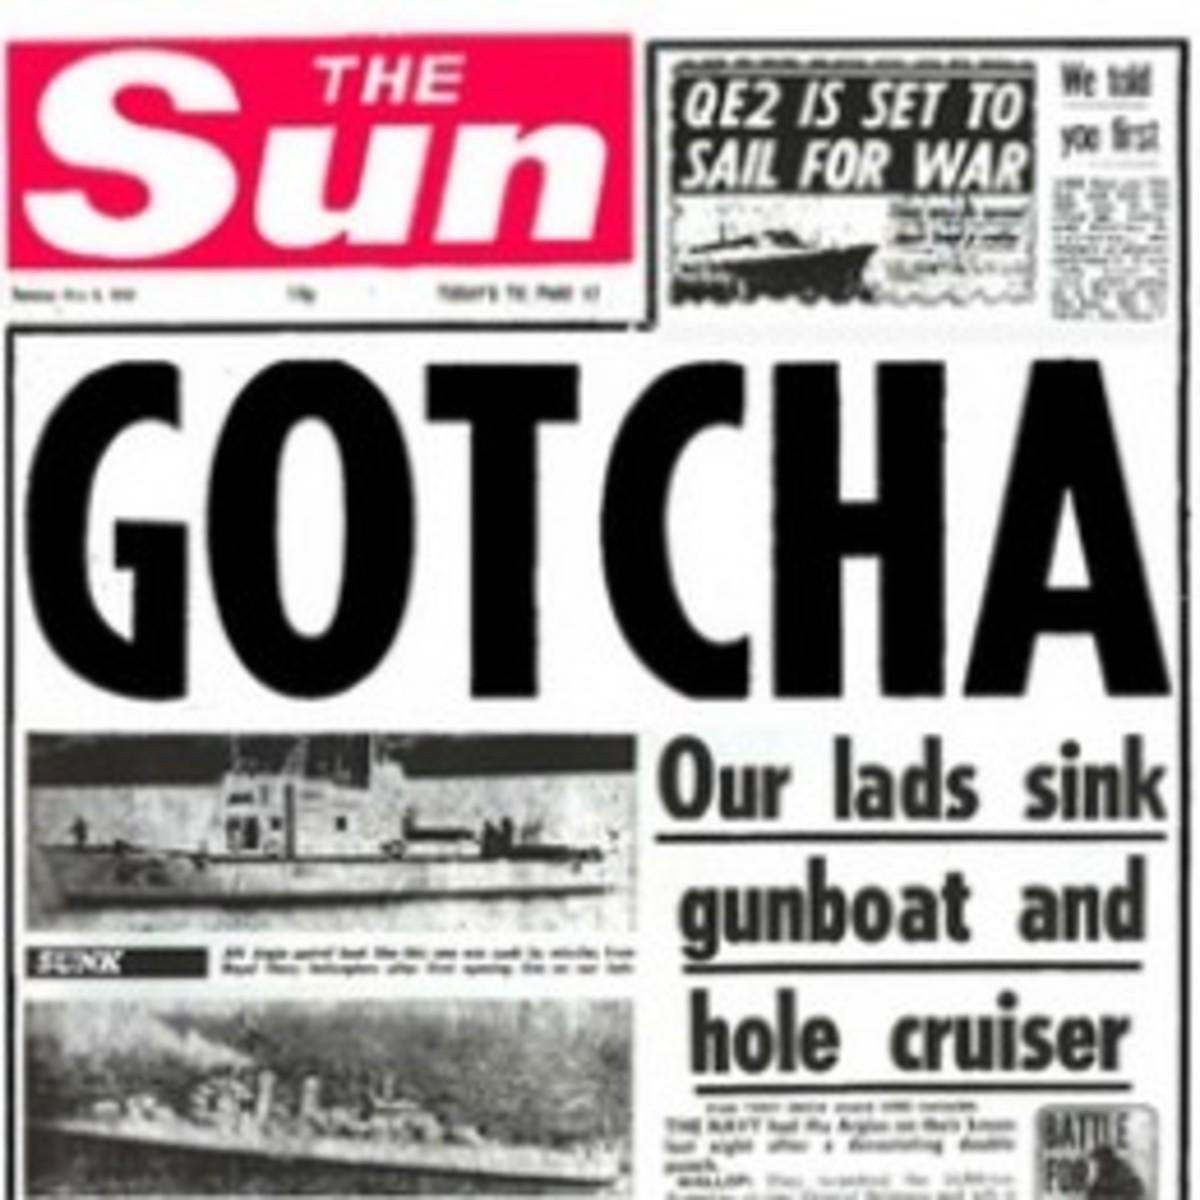 News Release Headline